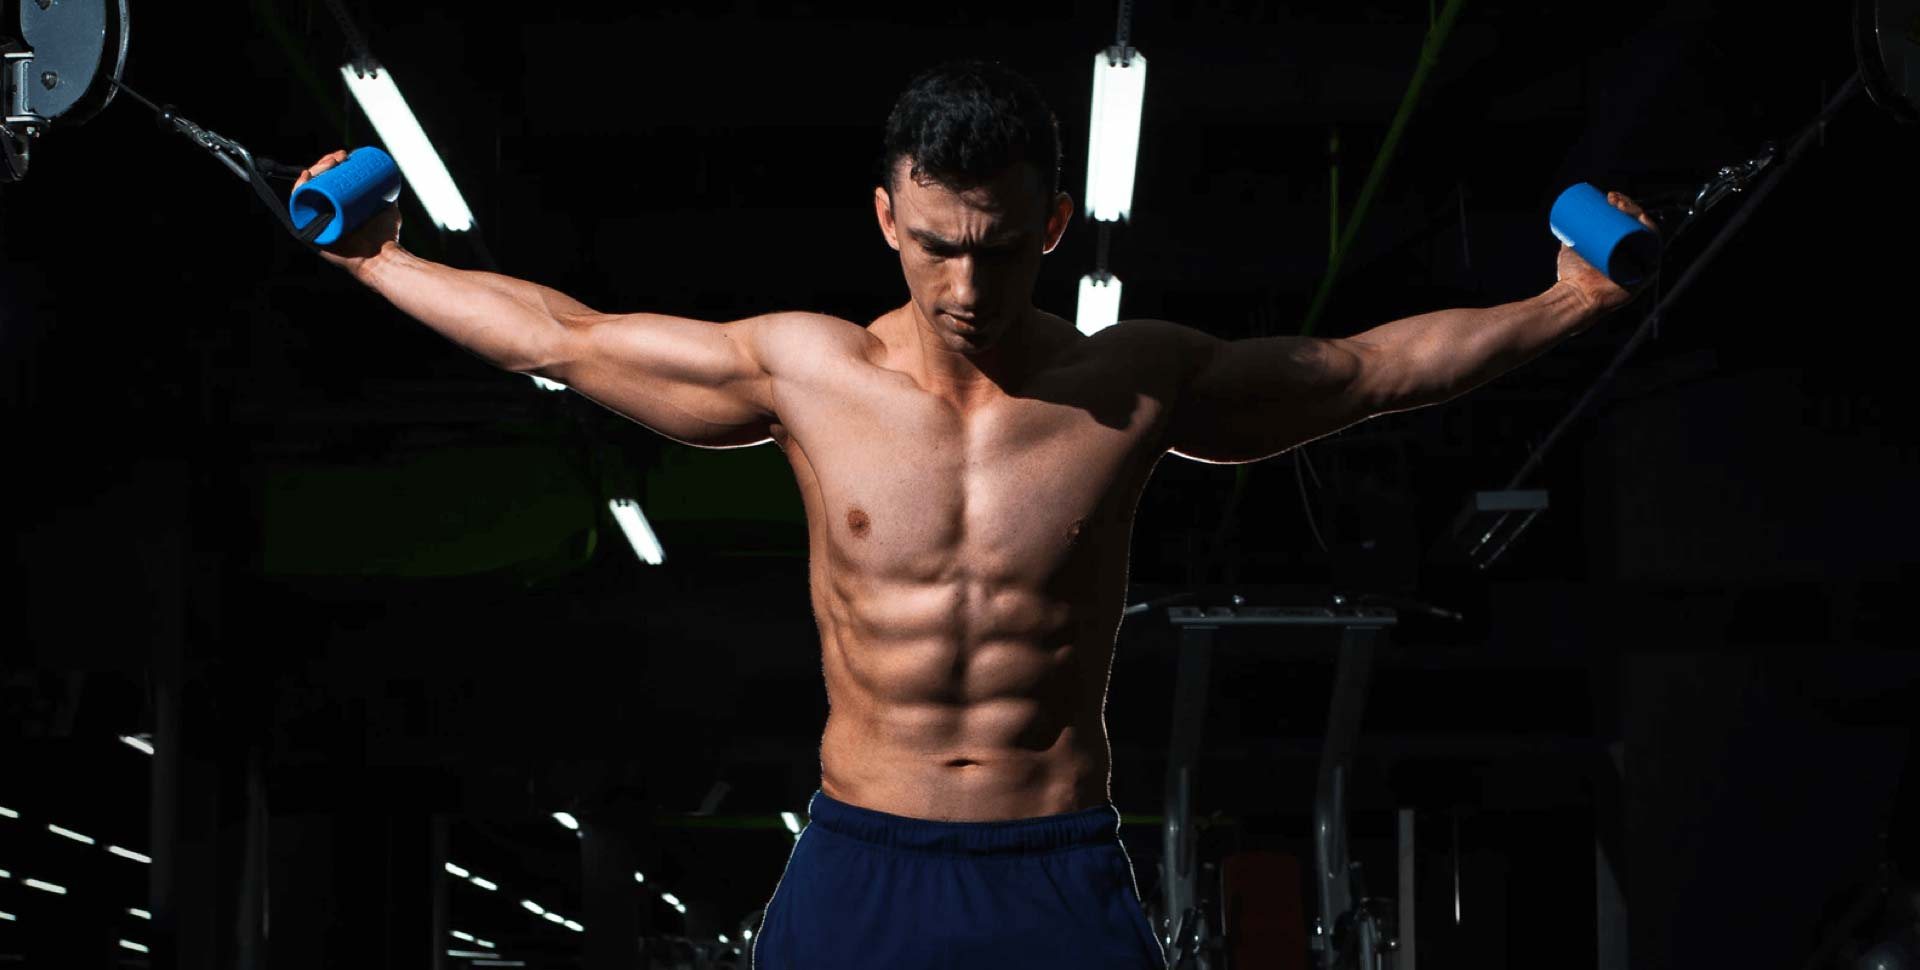 séance musculation progression